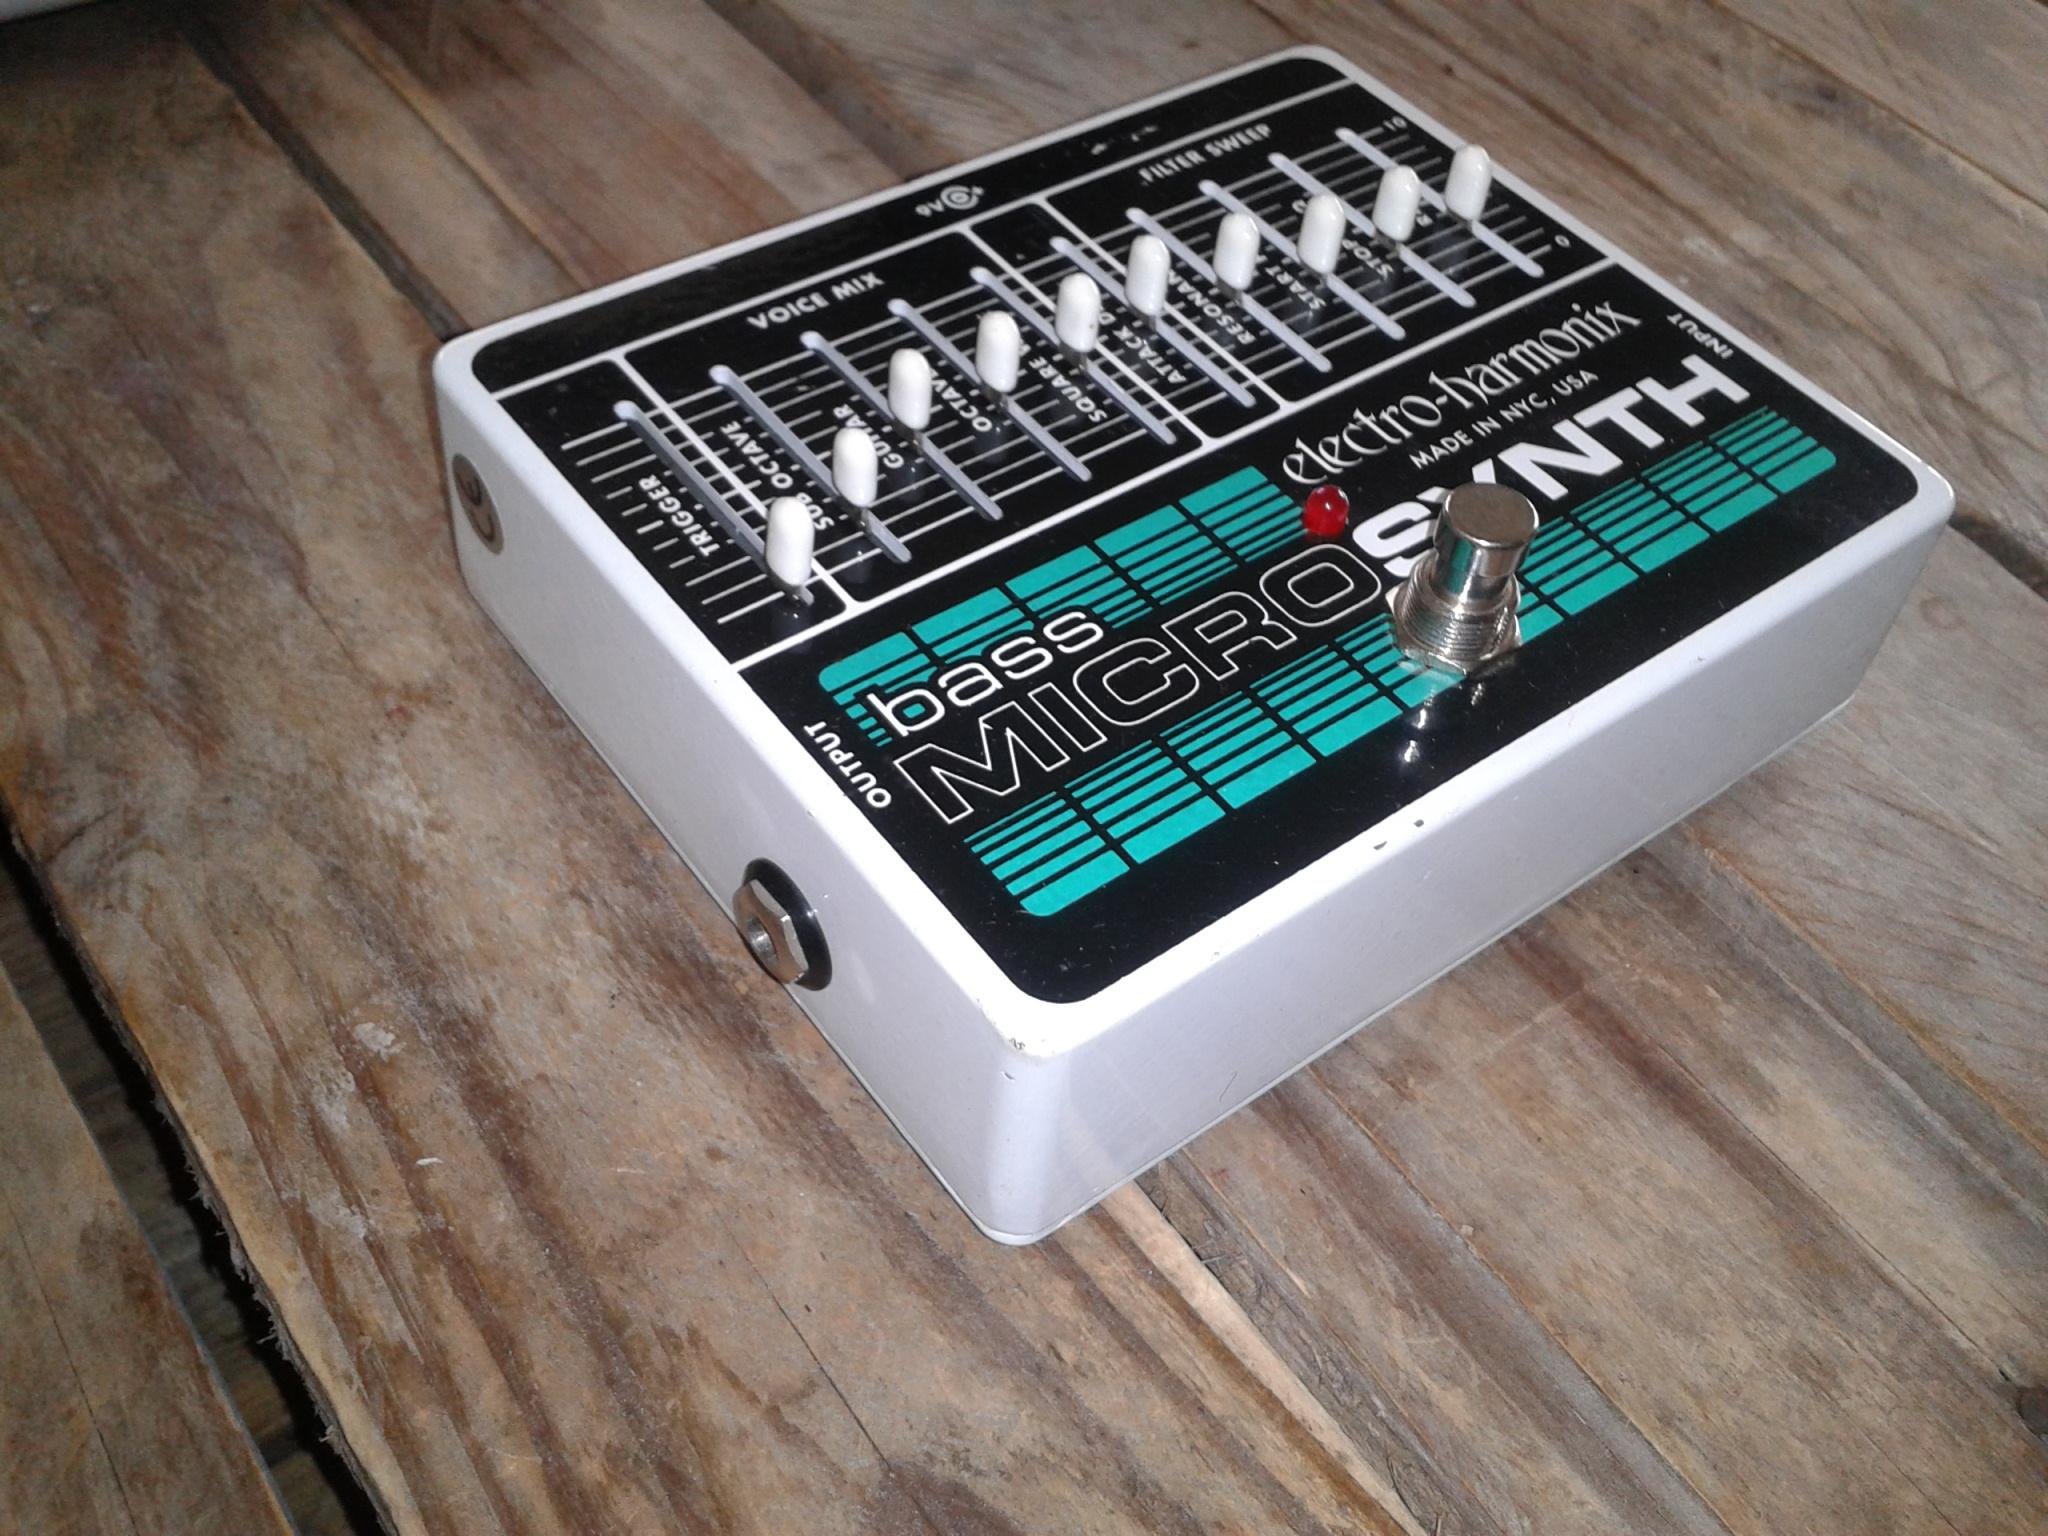 electro harmonix bass micro synth image 1881786 audiofanzine. Black Bedroom Furniture Sets. Home Design Ideas